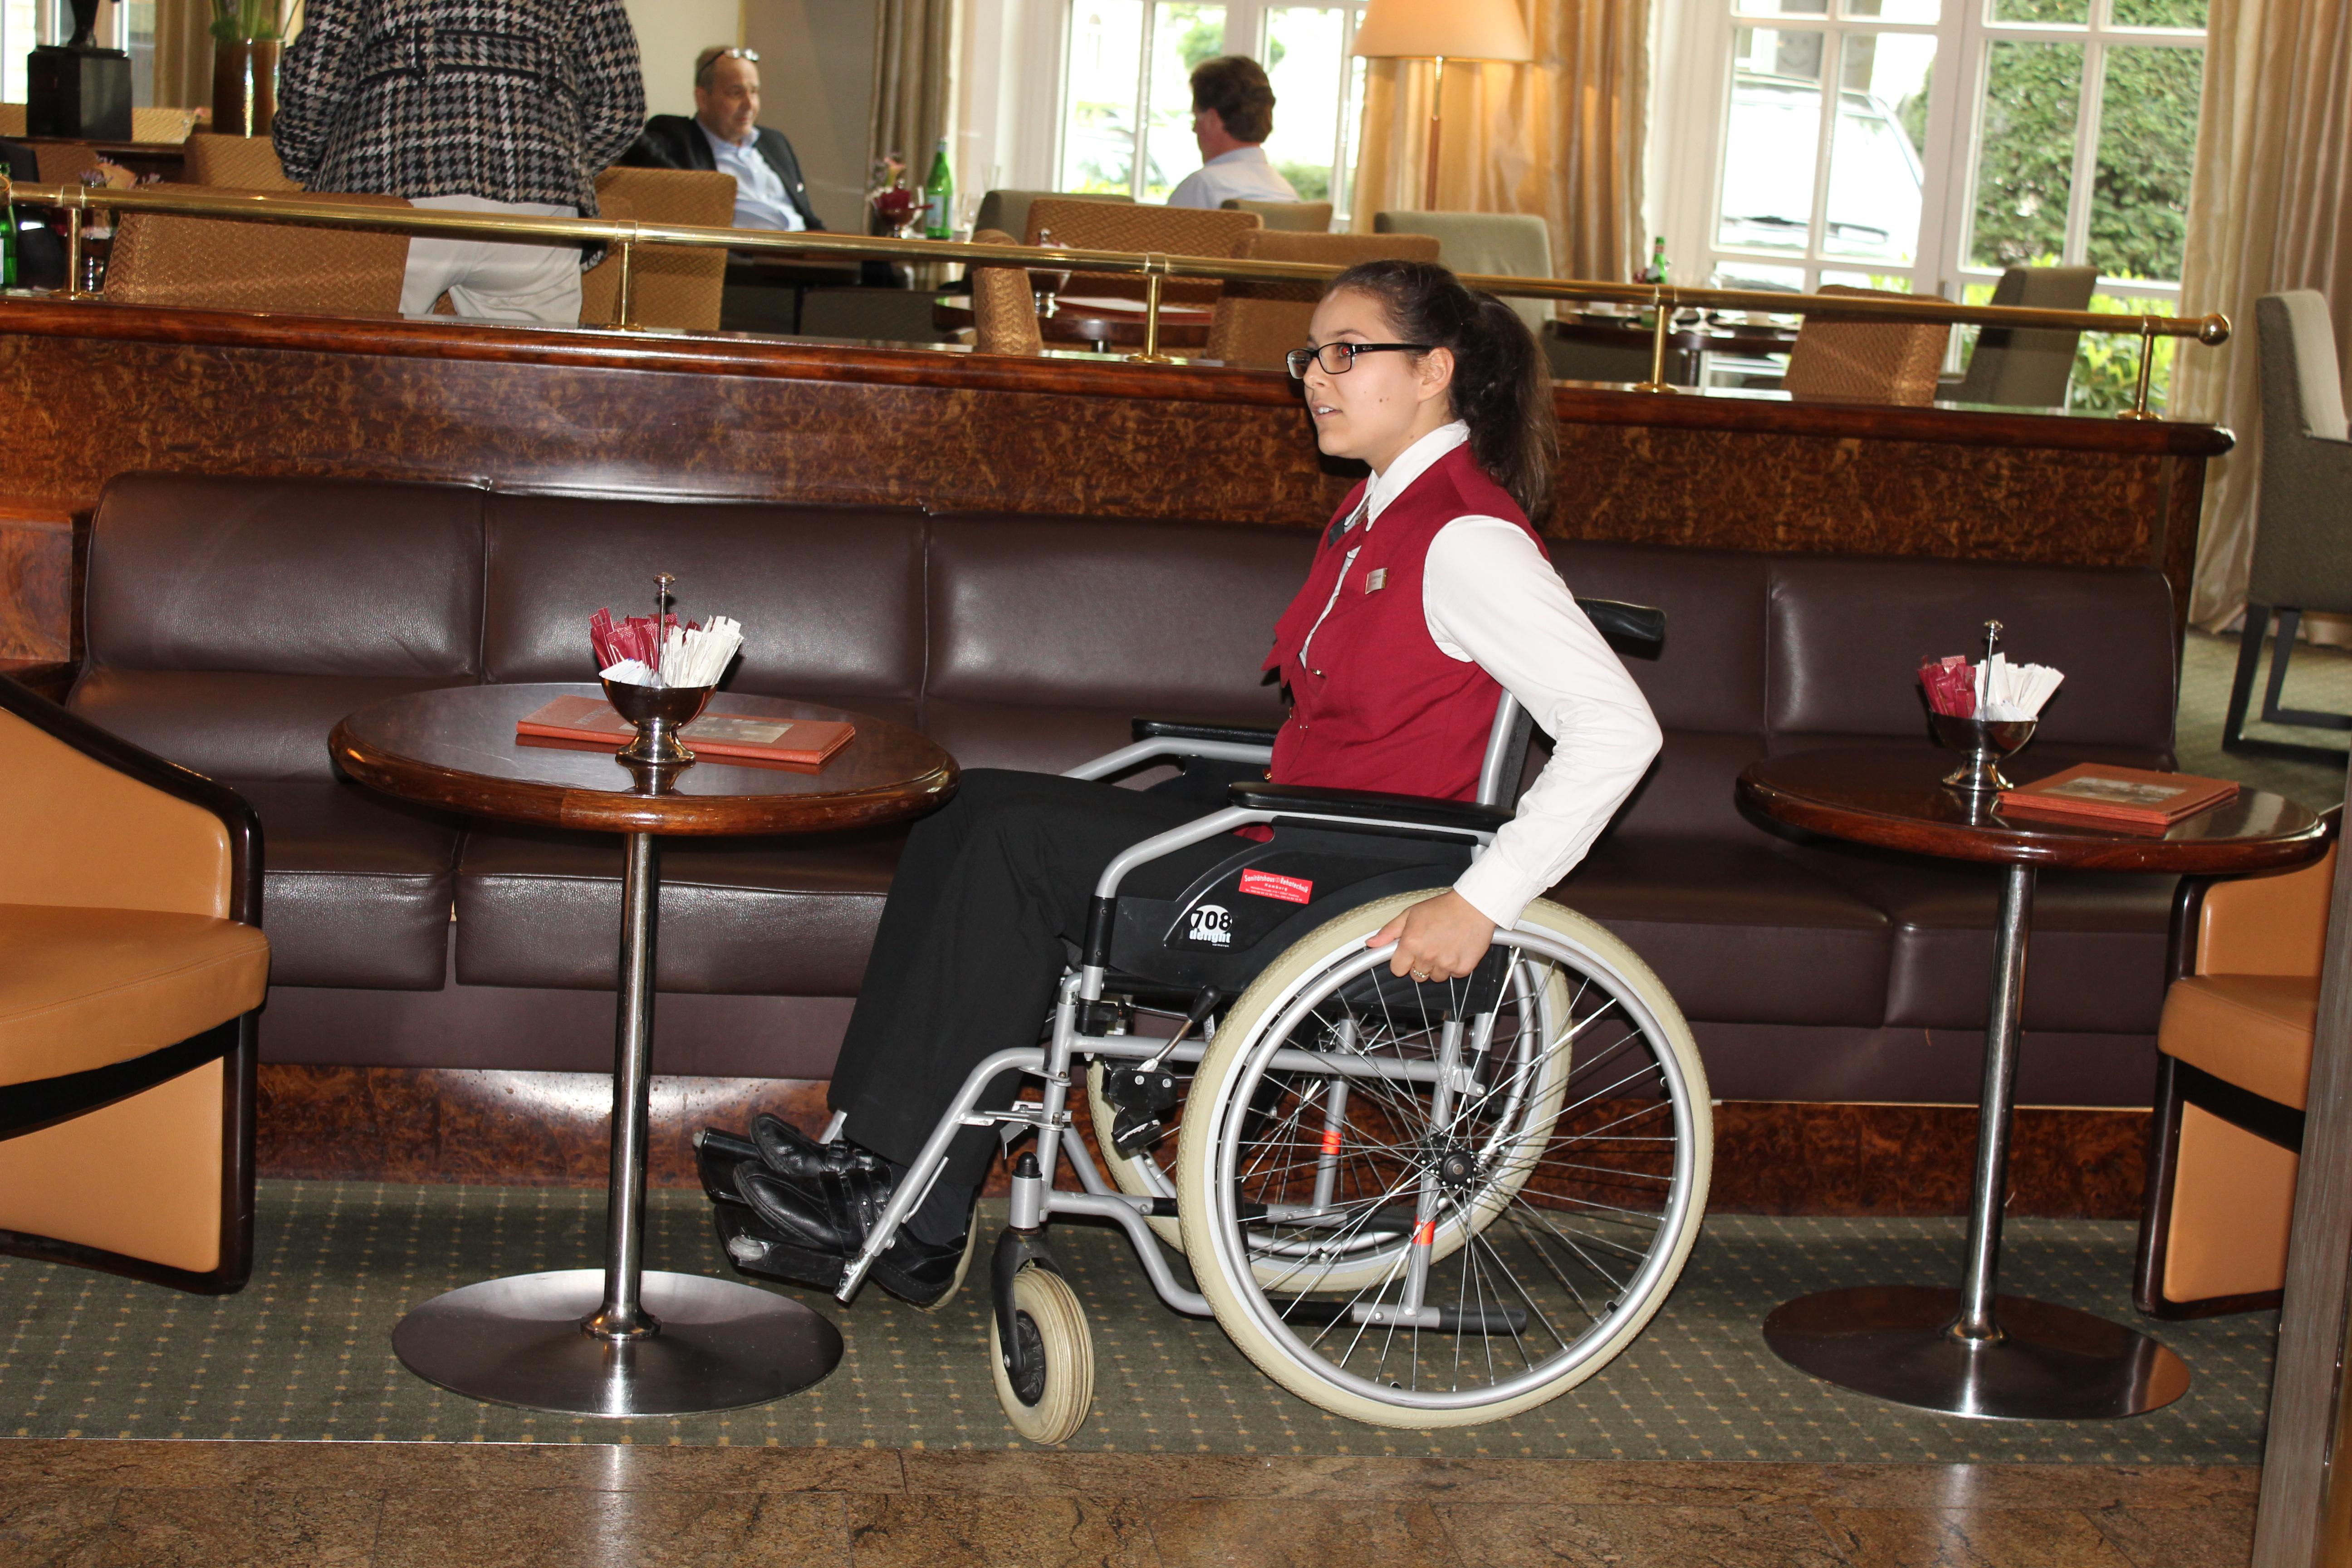 Frau im Rollstuhl im Restaurant eines Hotels